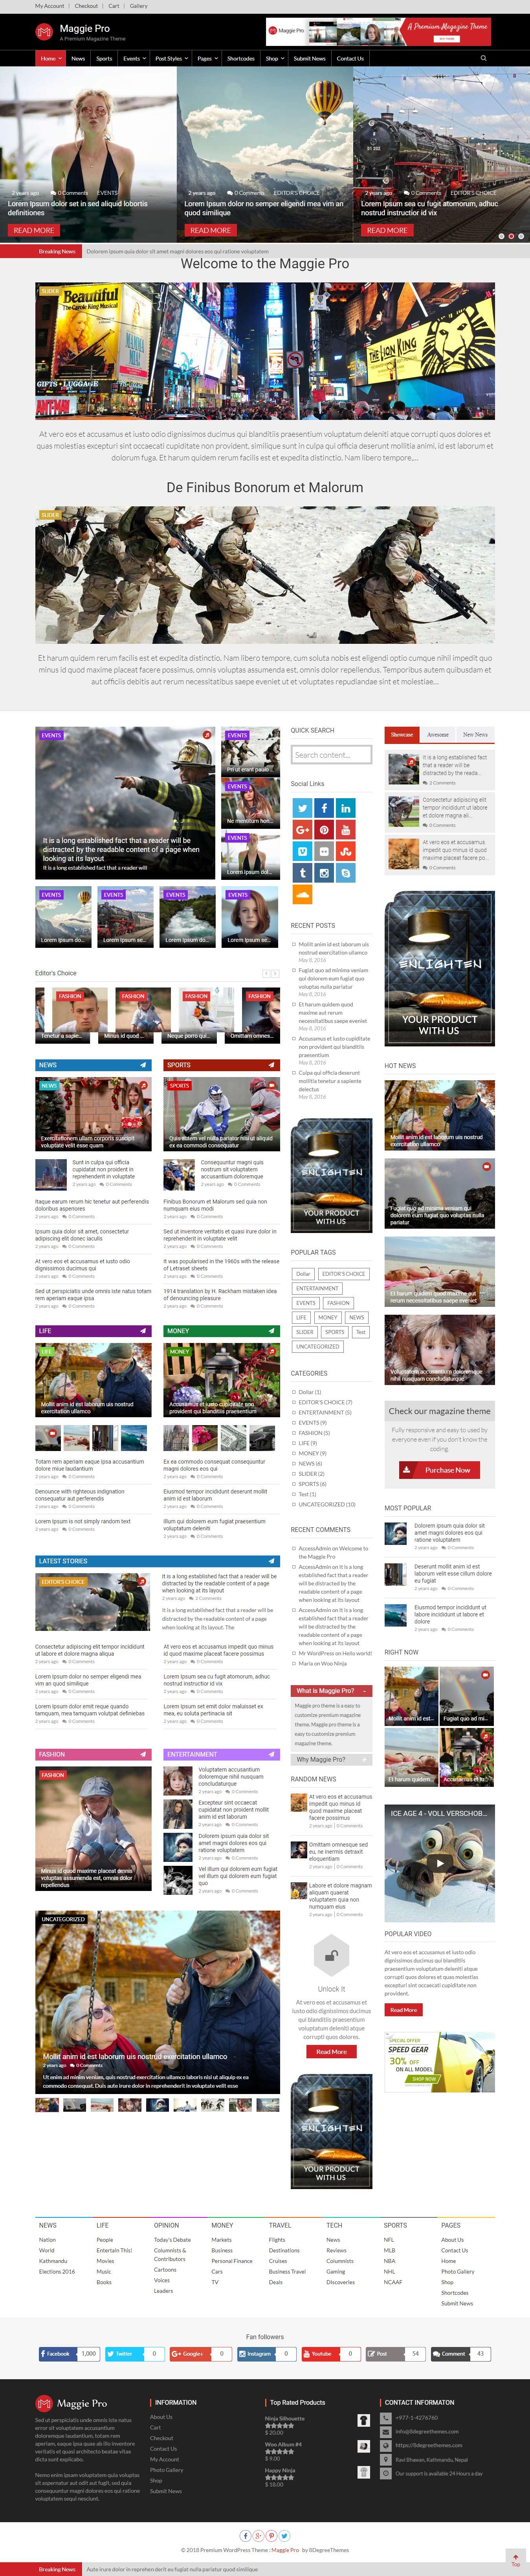 Maggie Pro - Best Premium Responsive WordPress Themes